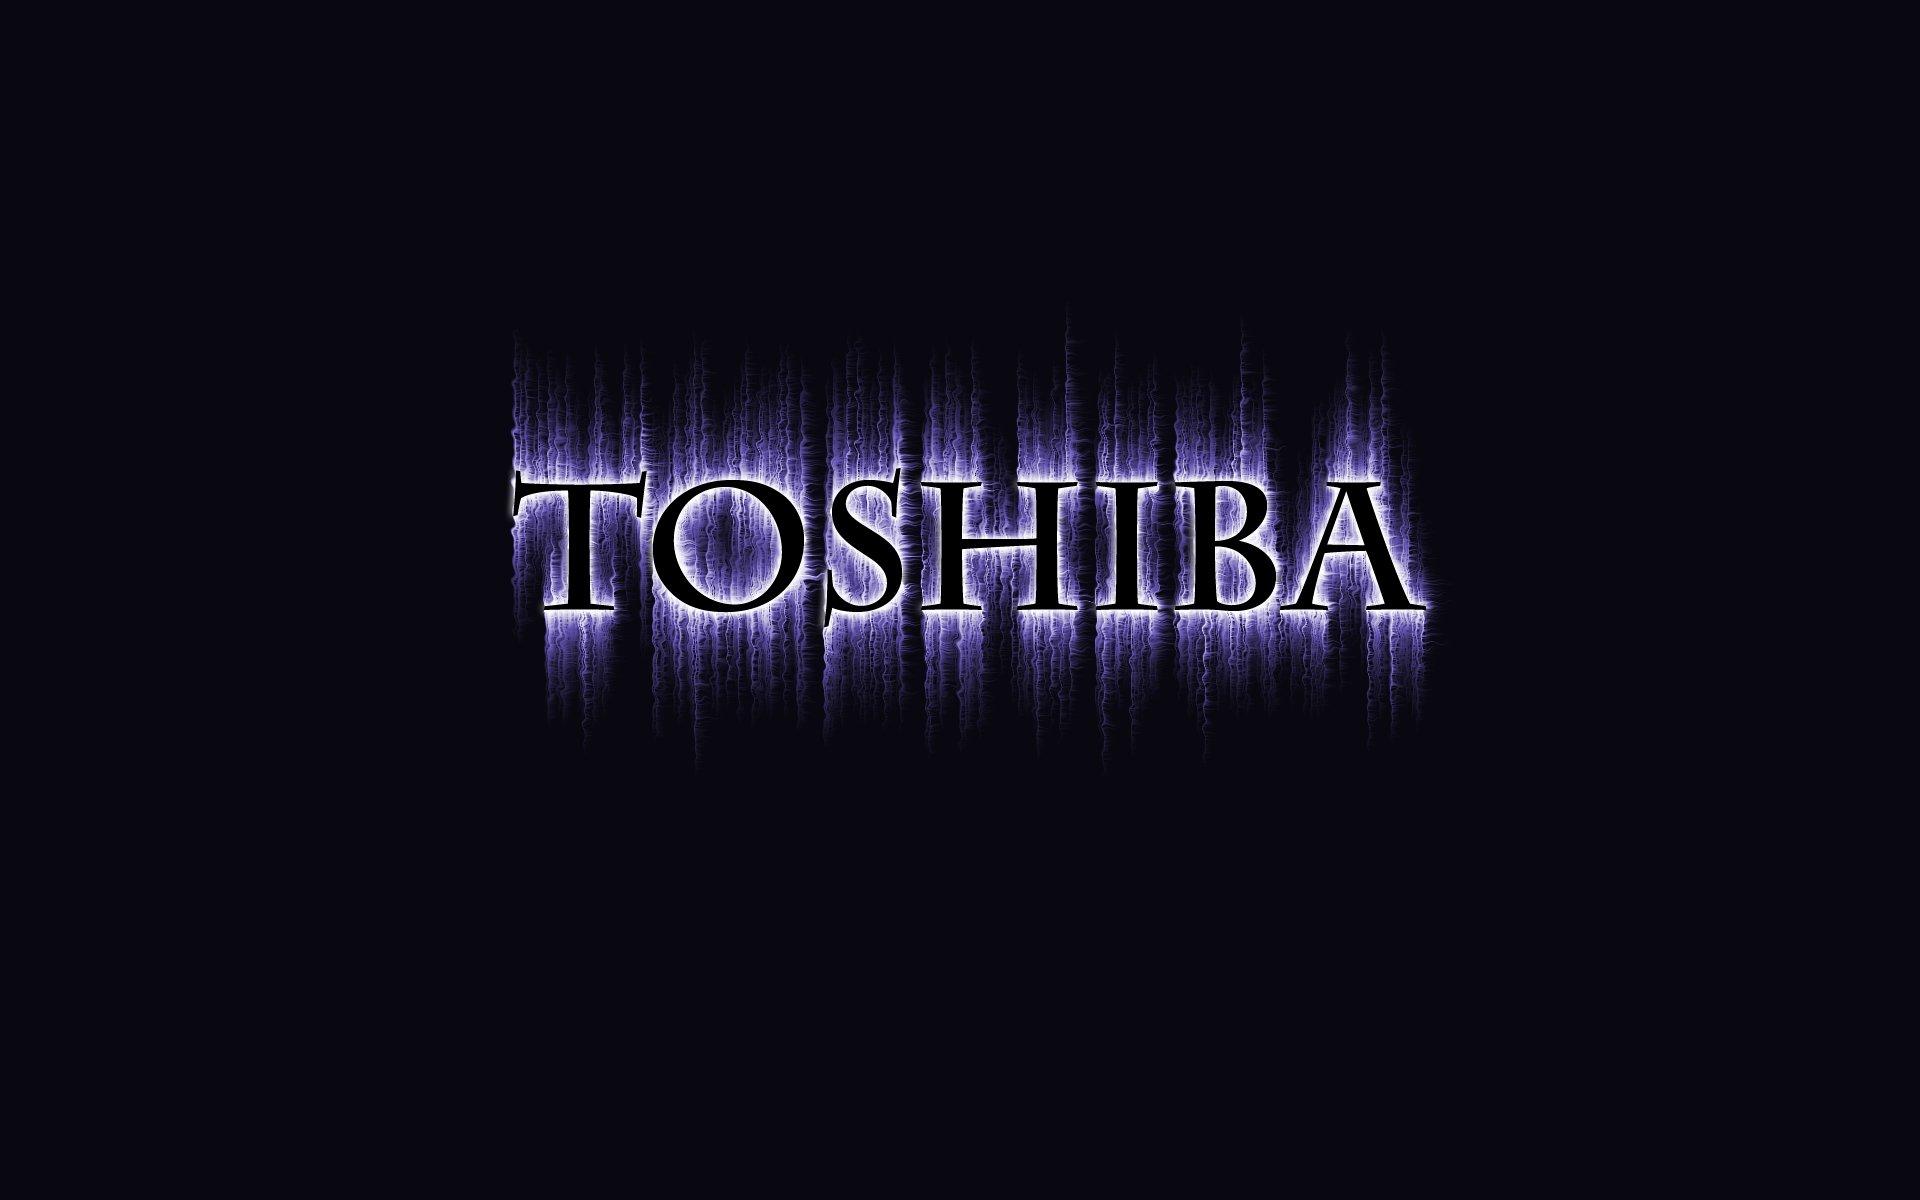 TOSHIBA computer wallpaper background 1920x1200